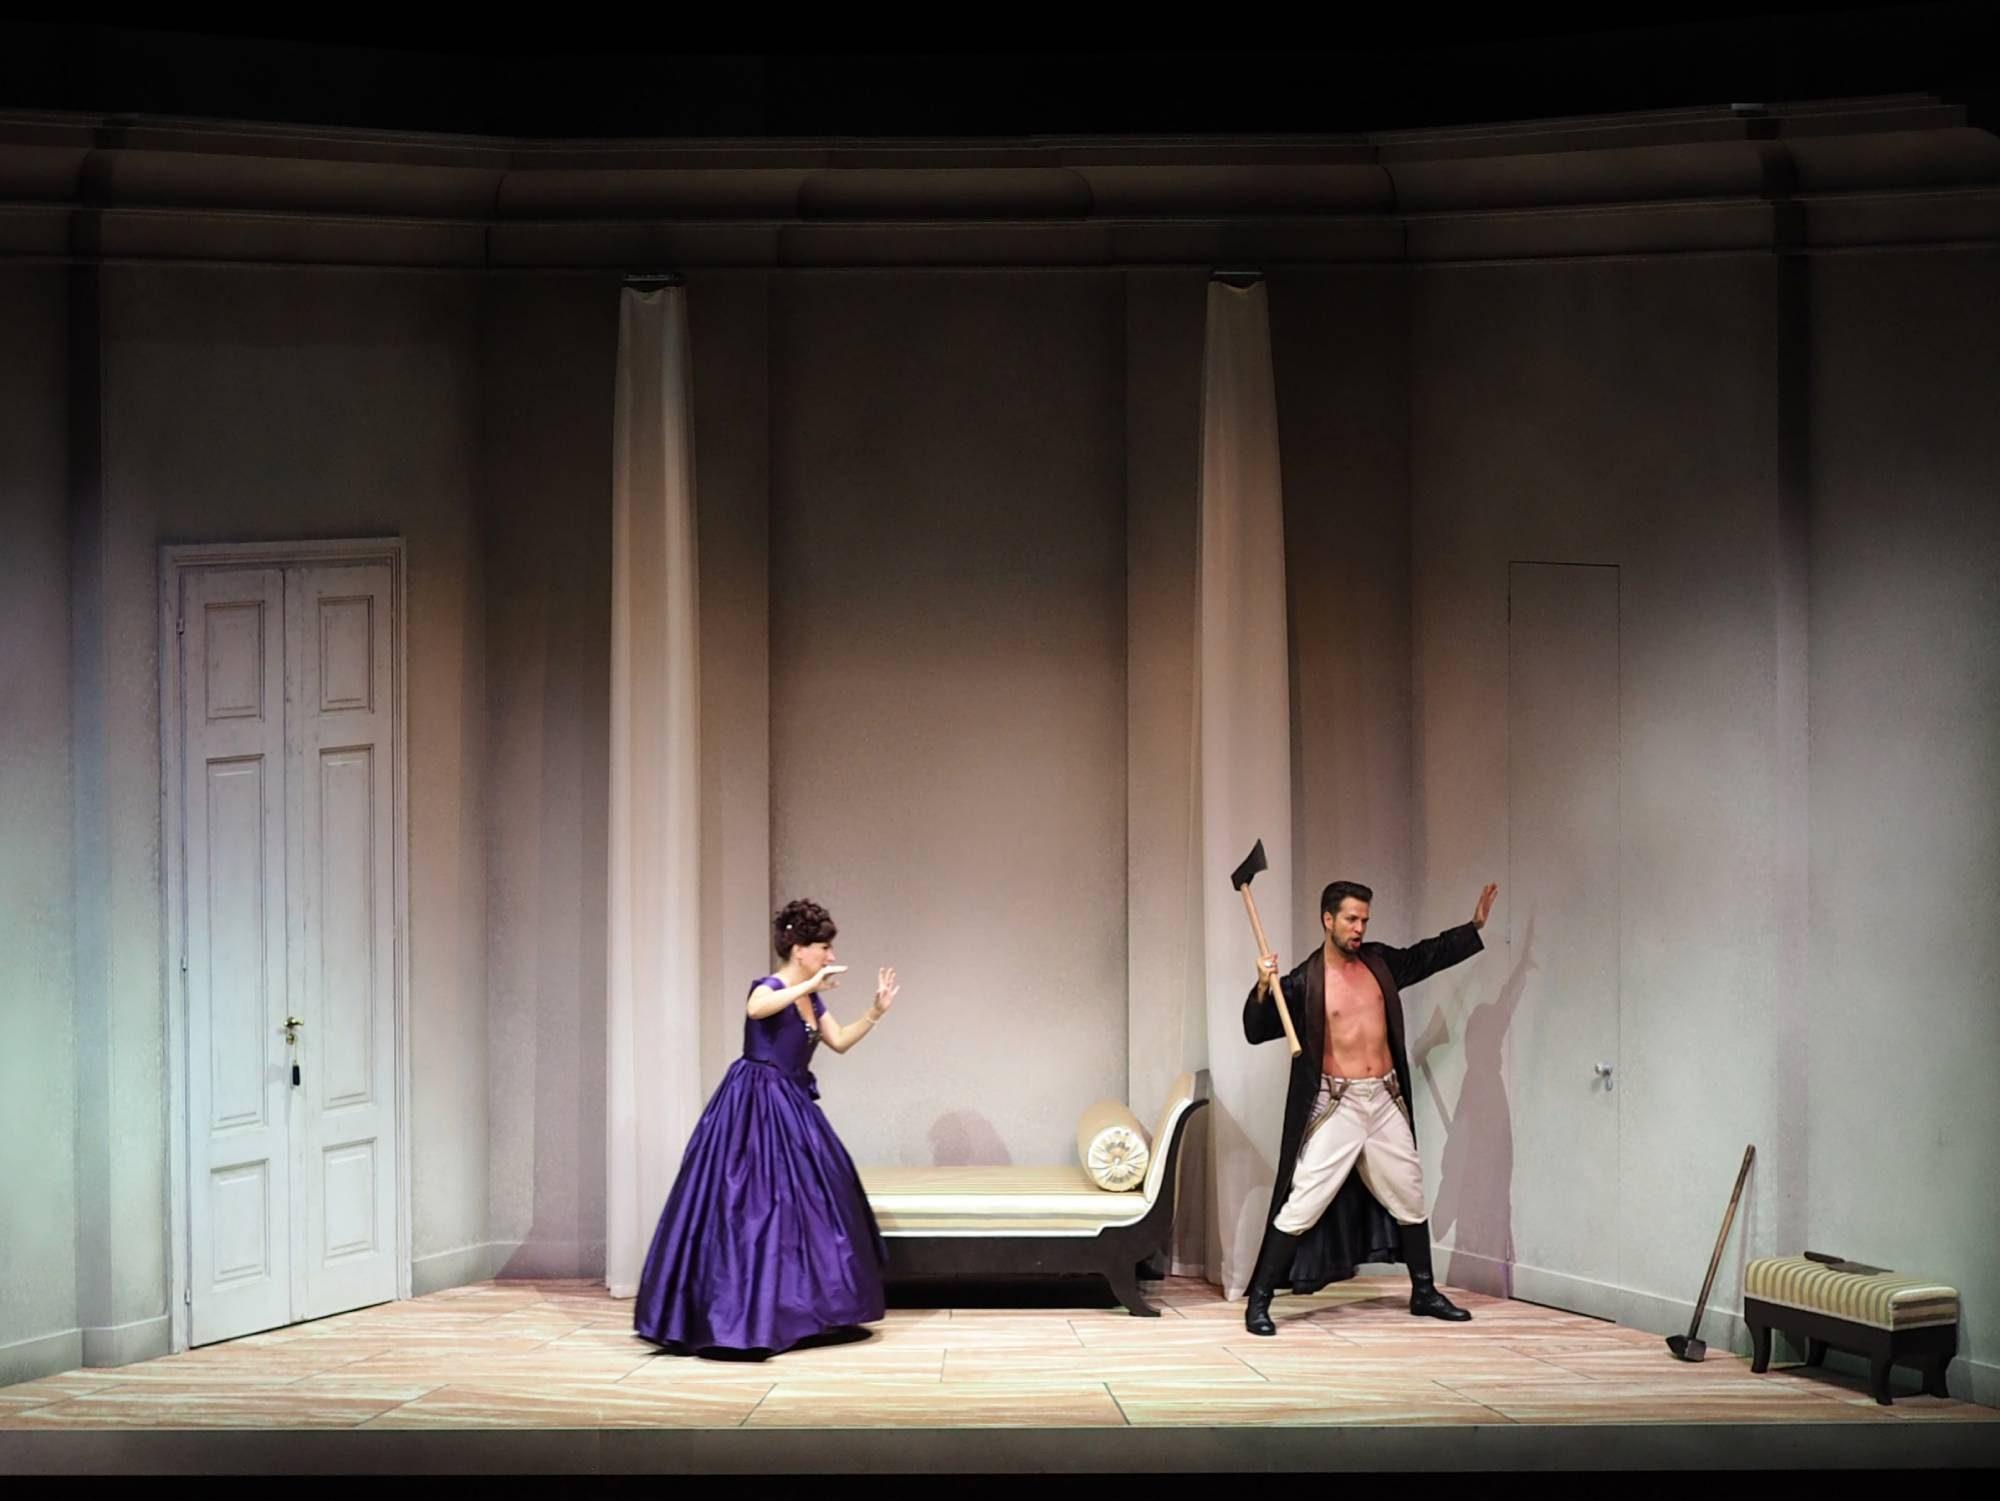 Le nozze di Figaro, Regie: Nicole Claudia Weber, Foto: stagedesign